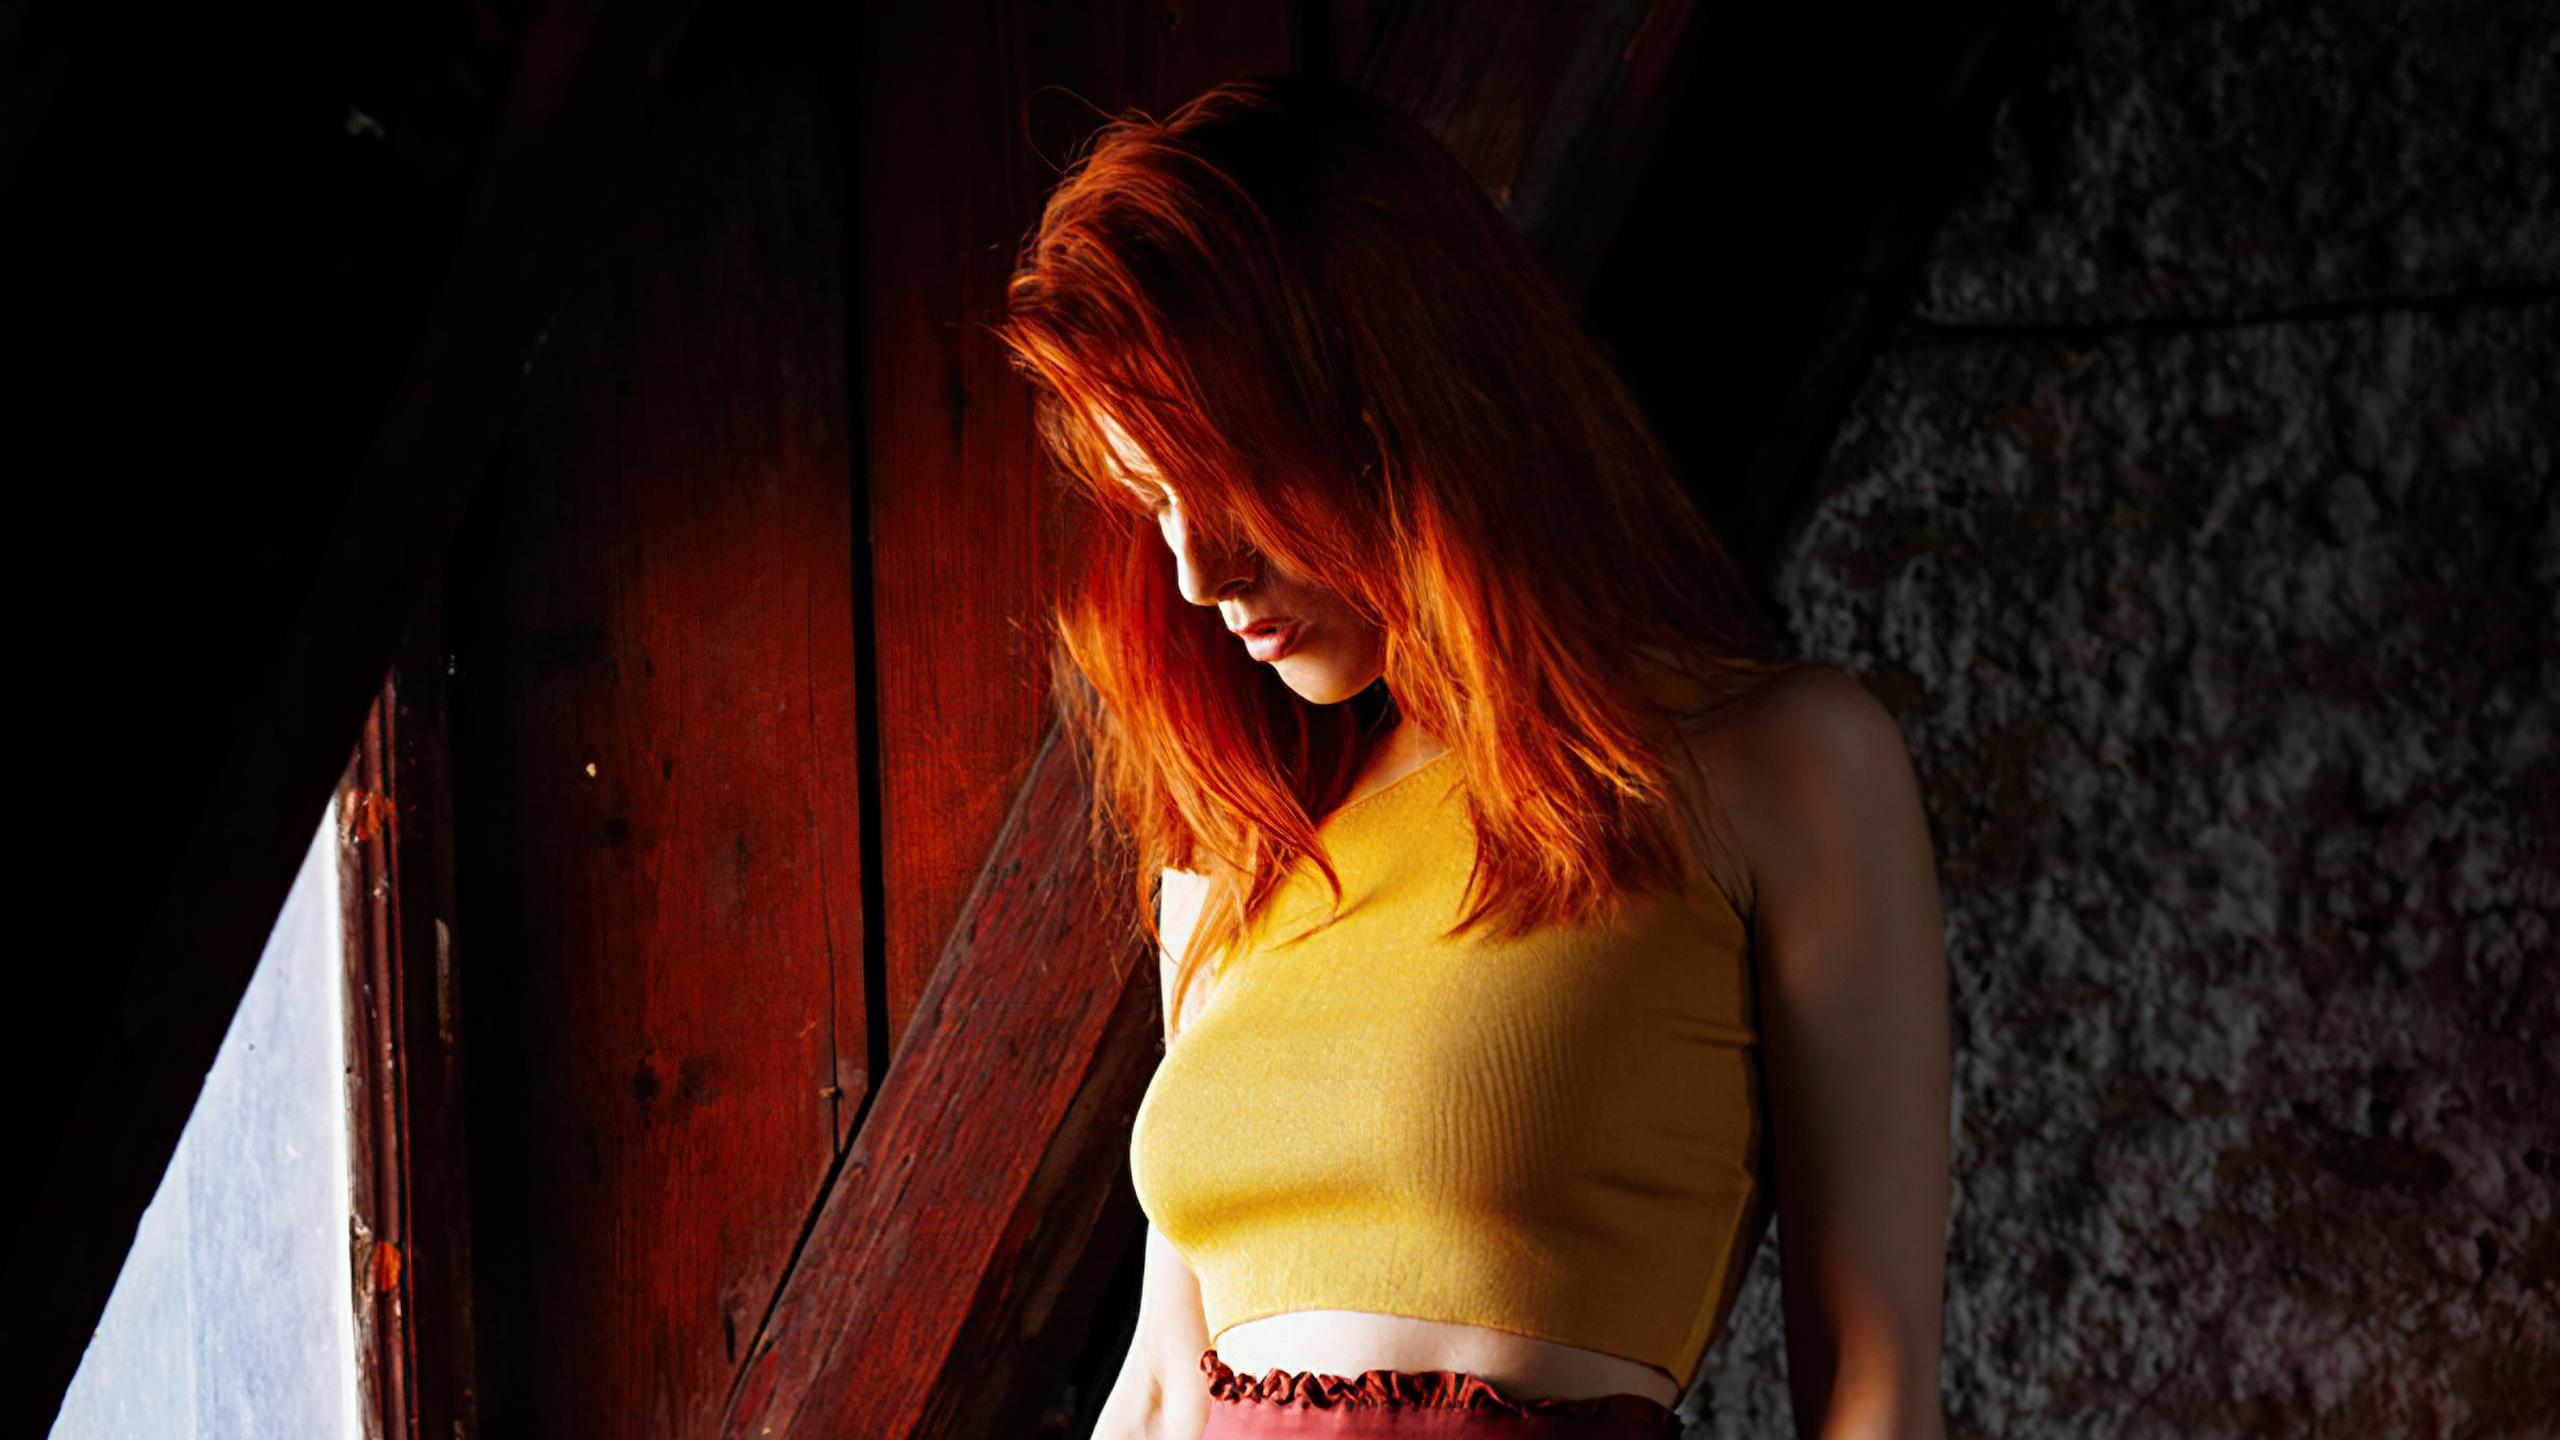 redhead-girl-morning-sunbeams-4k-0e.jpg